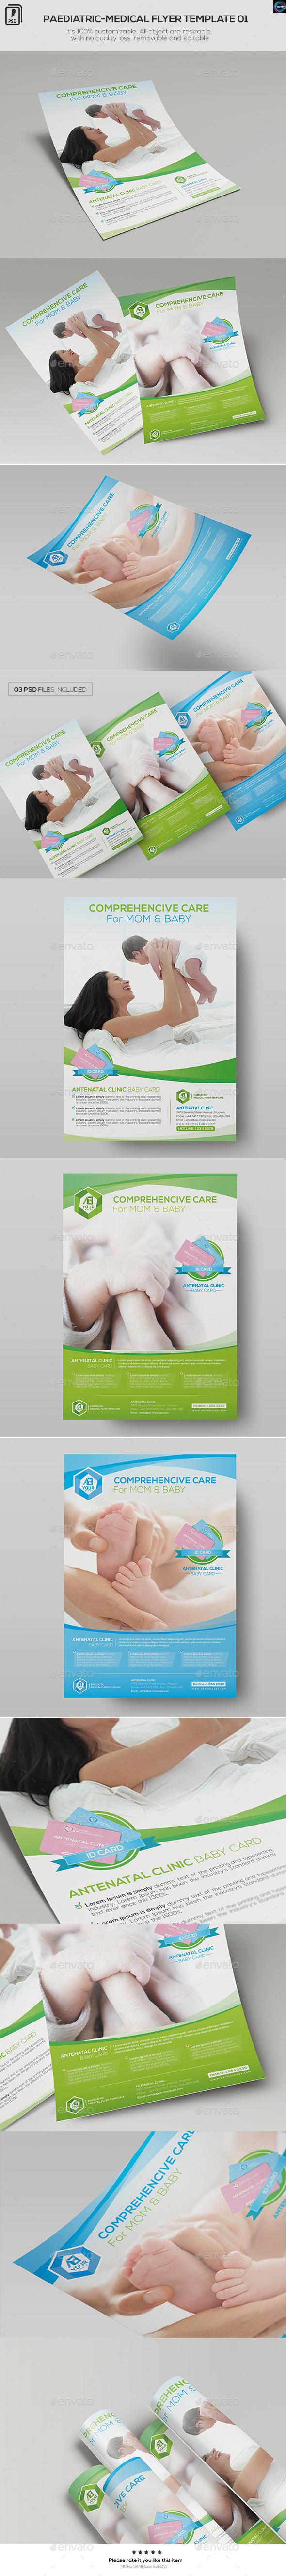 Paediatrics-Medical Flyer Template 01 - Corporate Flyers